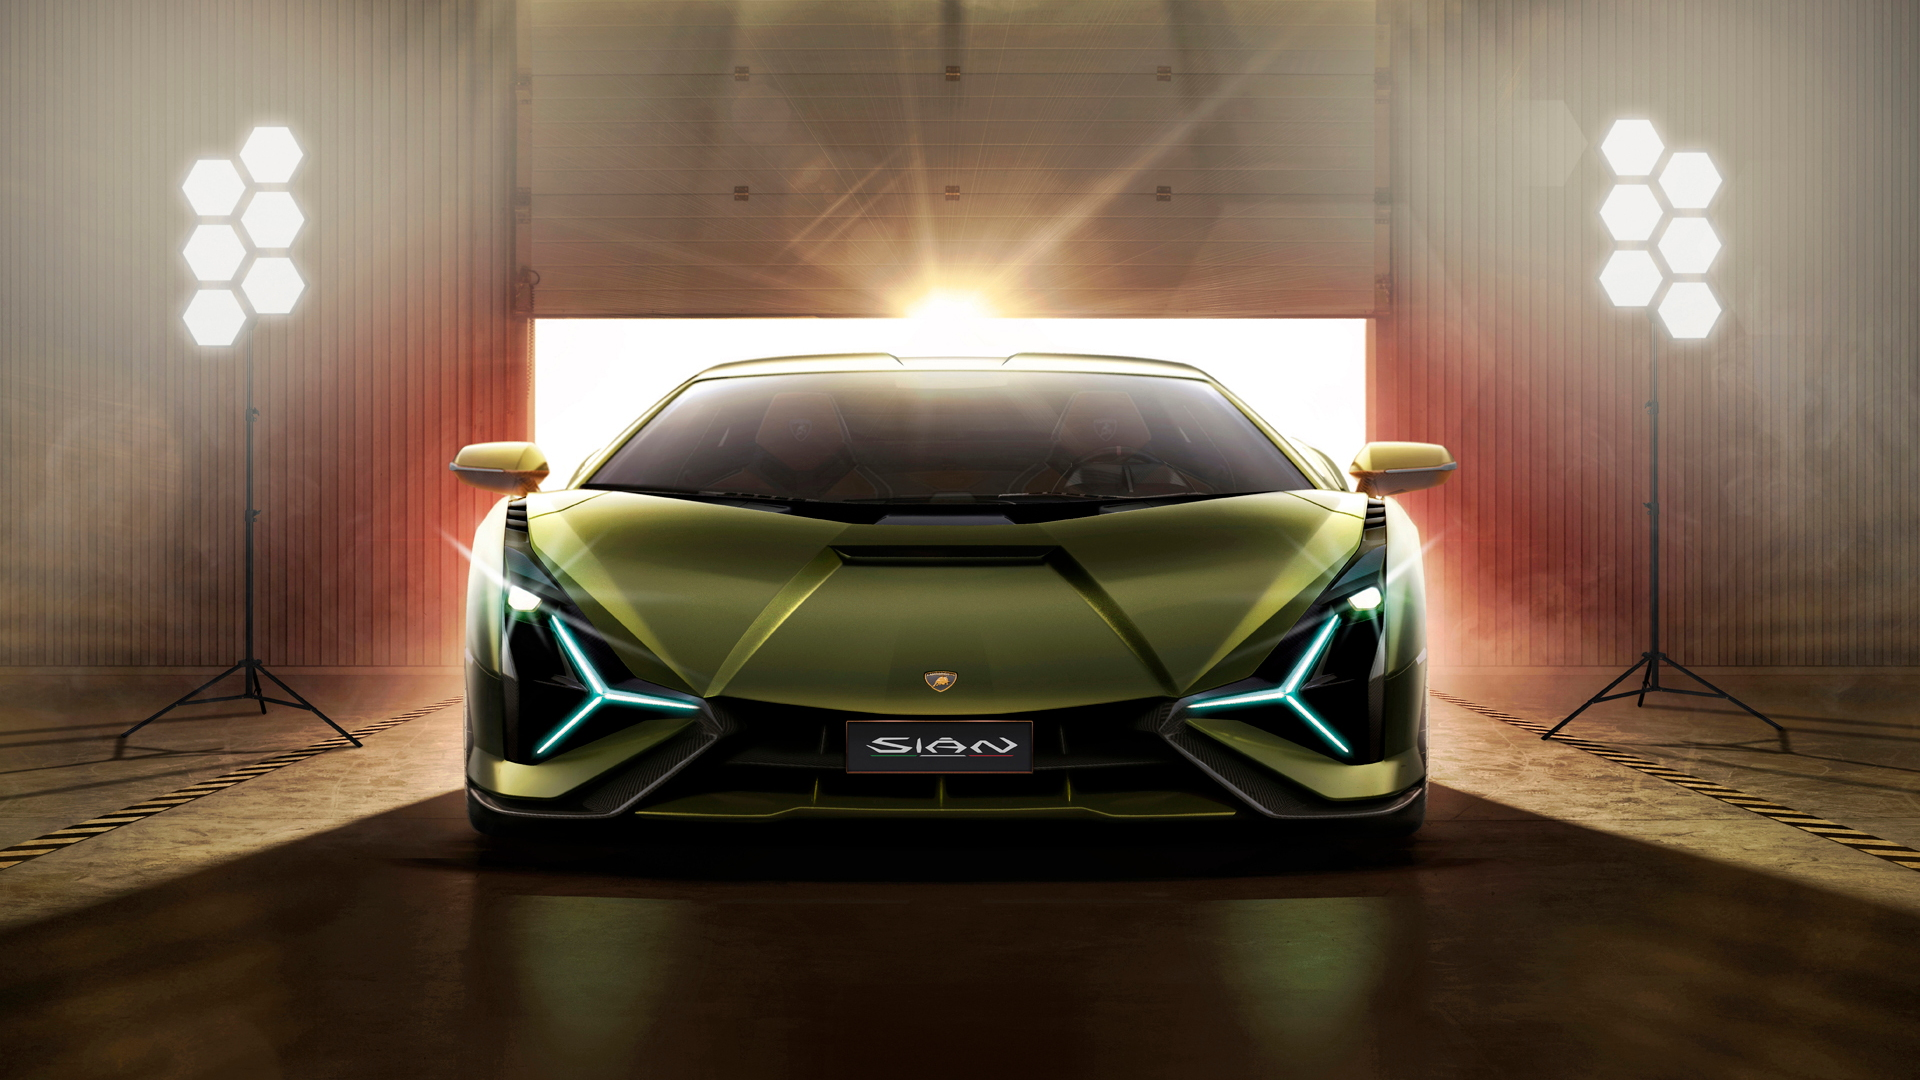 Lamborghini uses supercapacitors in its most powerful car ever